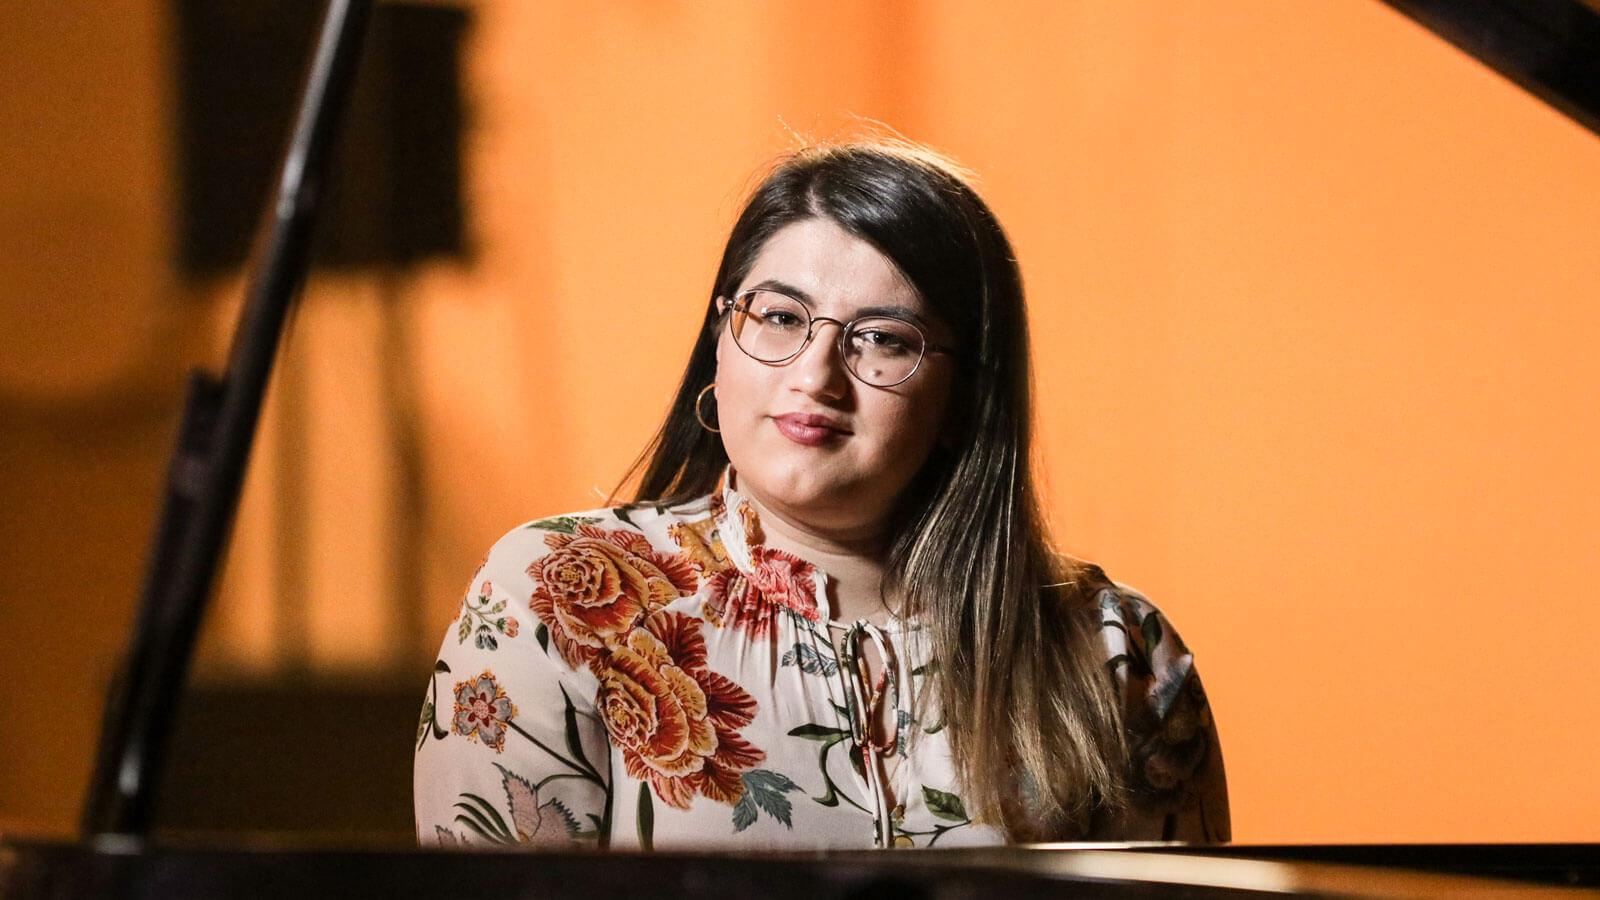 Master the art of musicianship at Baylor University School of Music